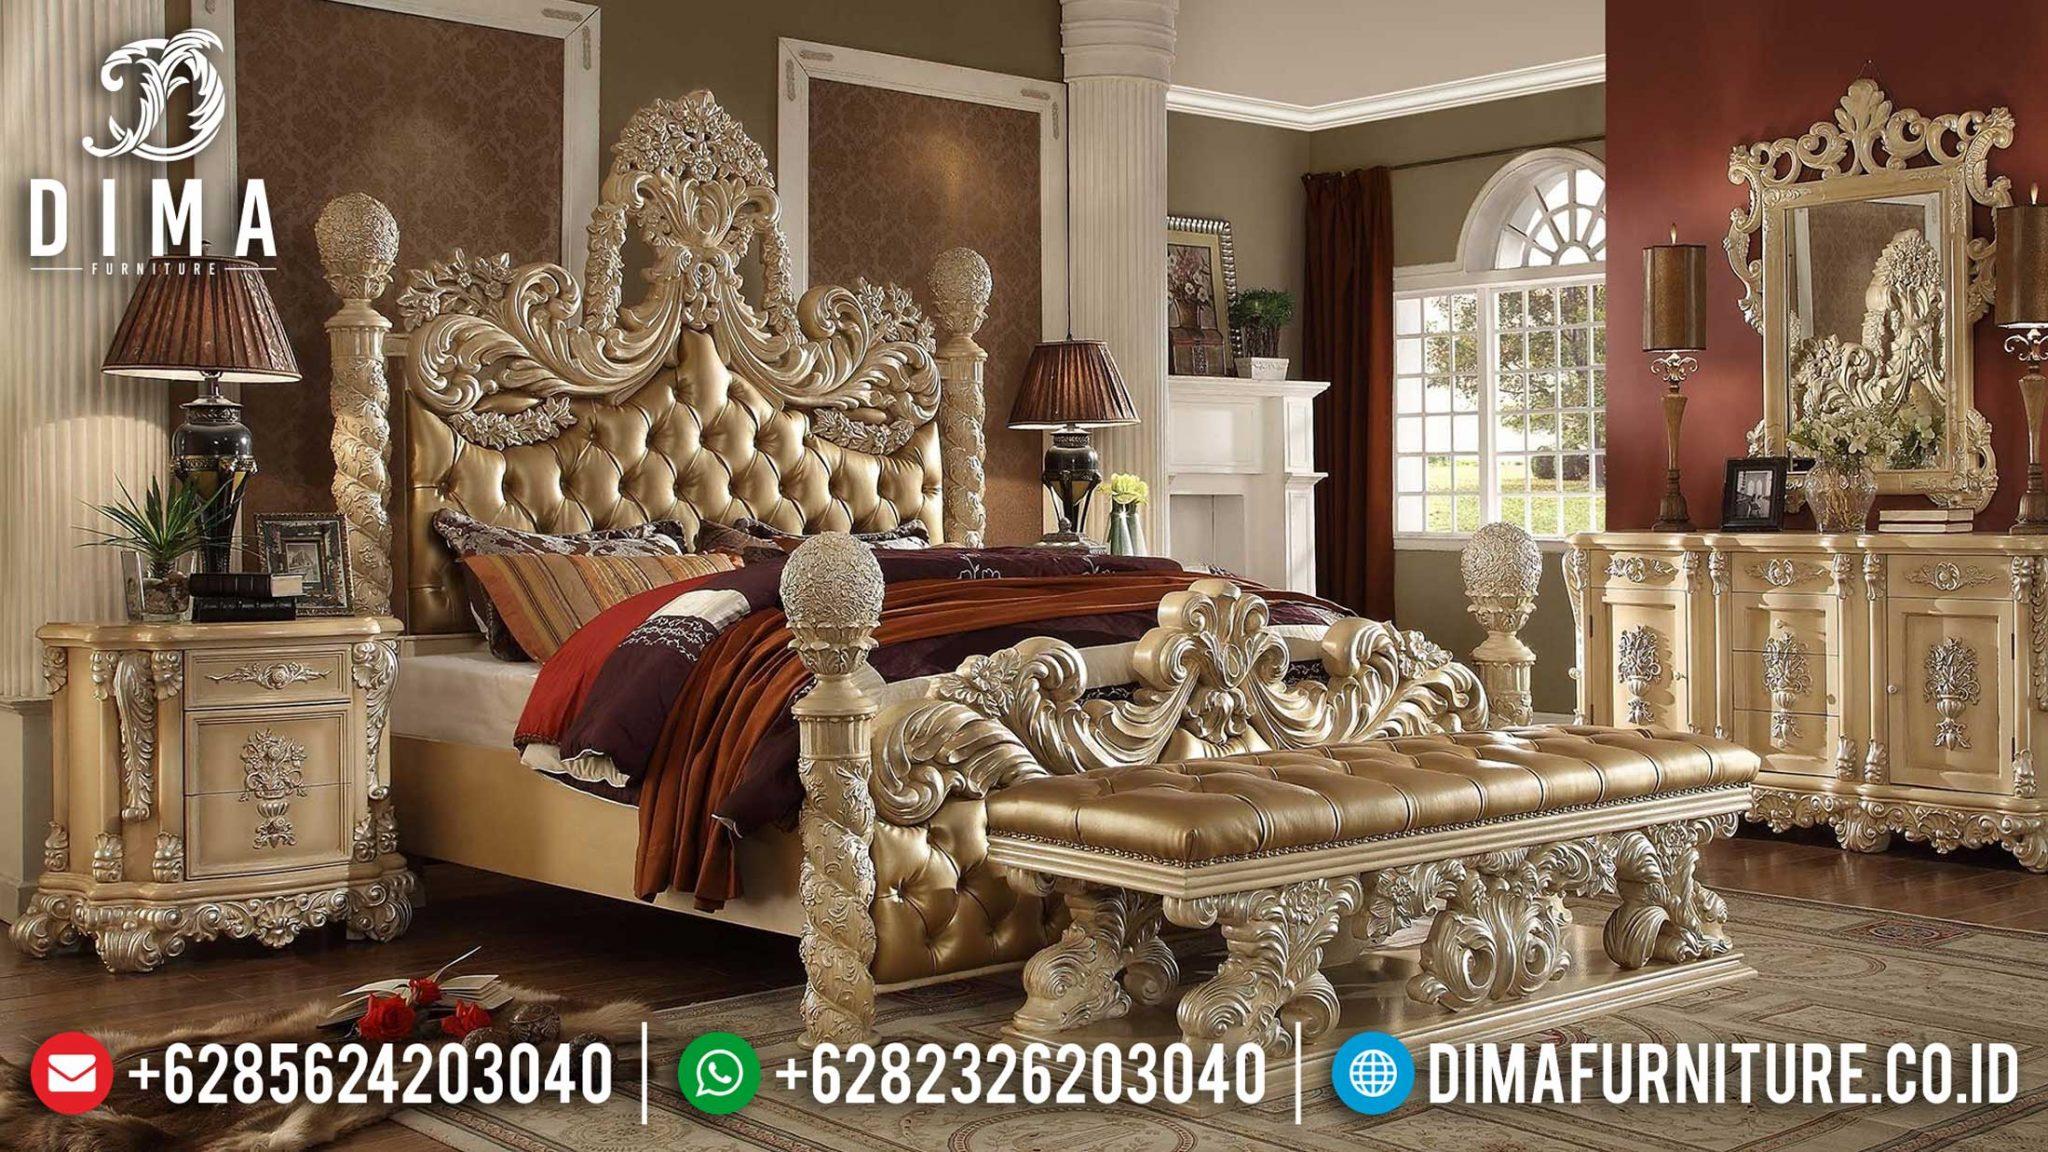 Design Interior Kamar Set Ukir Jepara Luxury Classic Olimpico Rome Style TTJ-1135